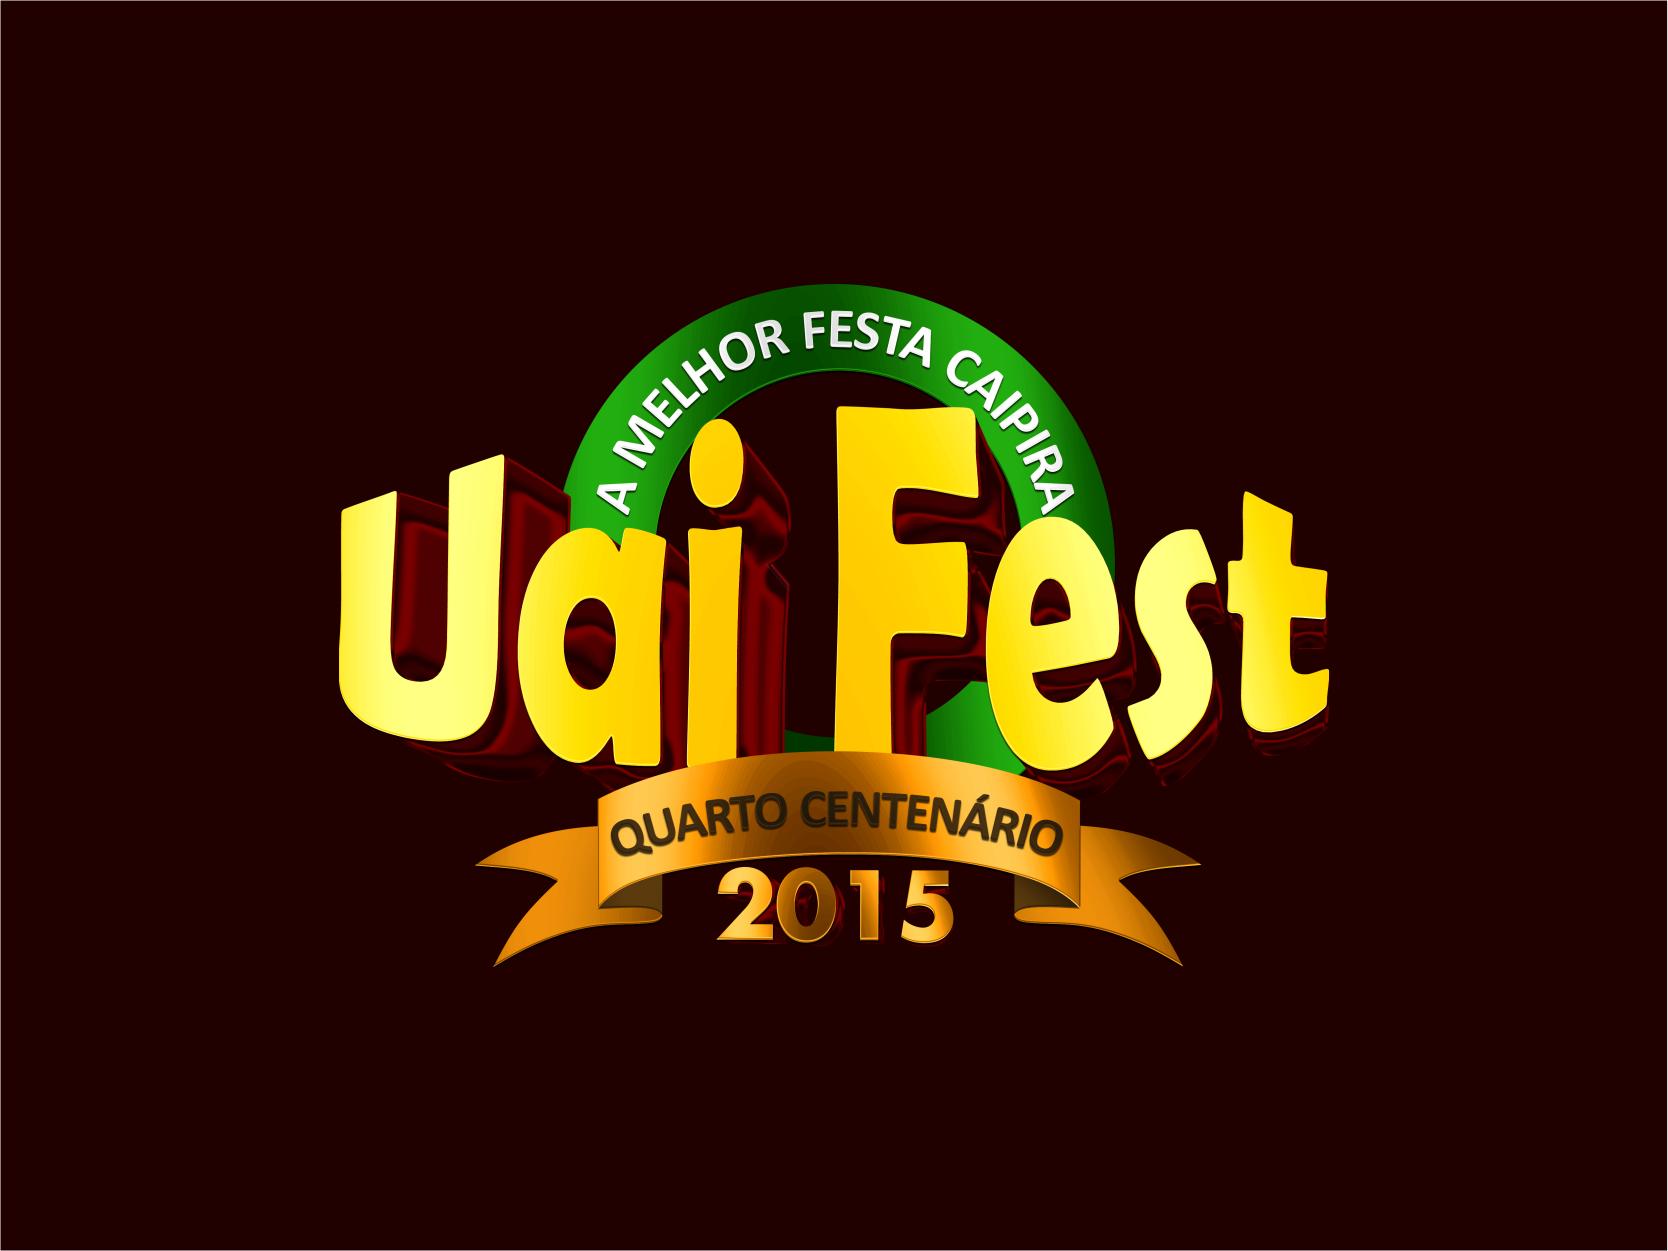 Uai Fest